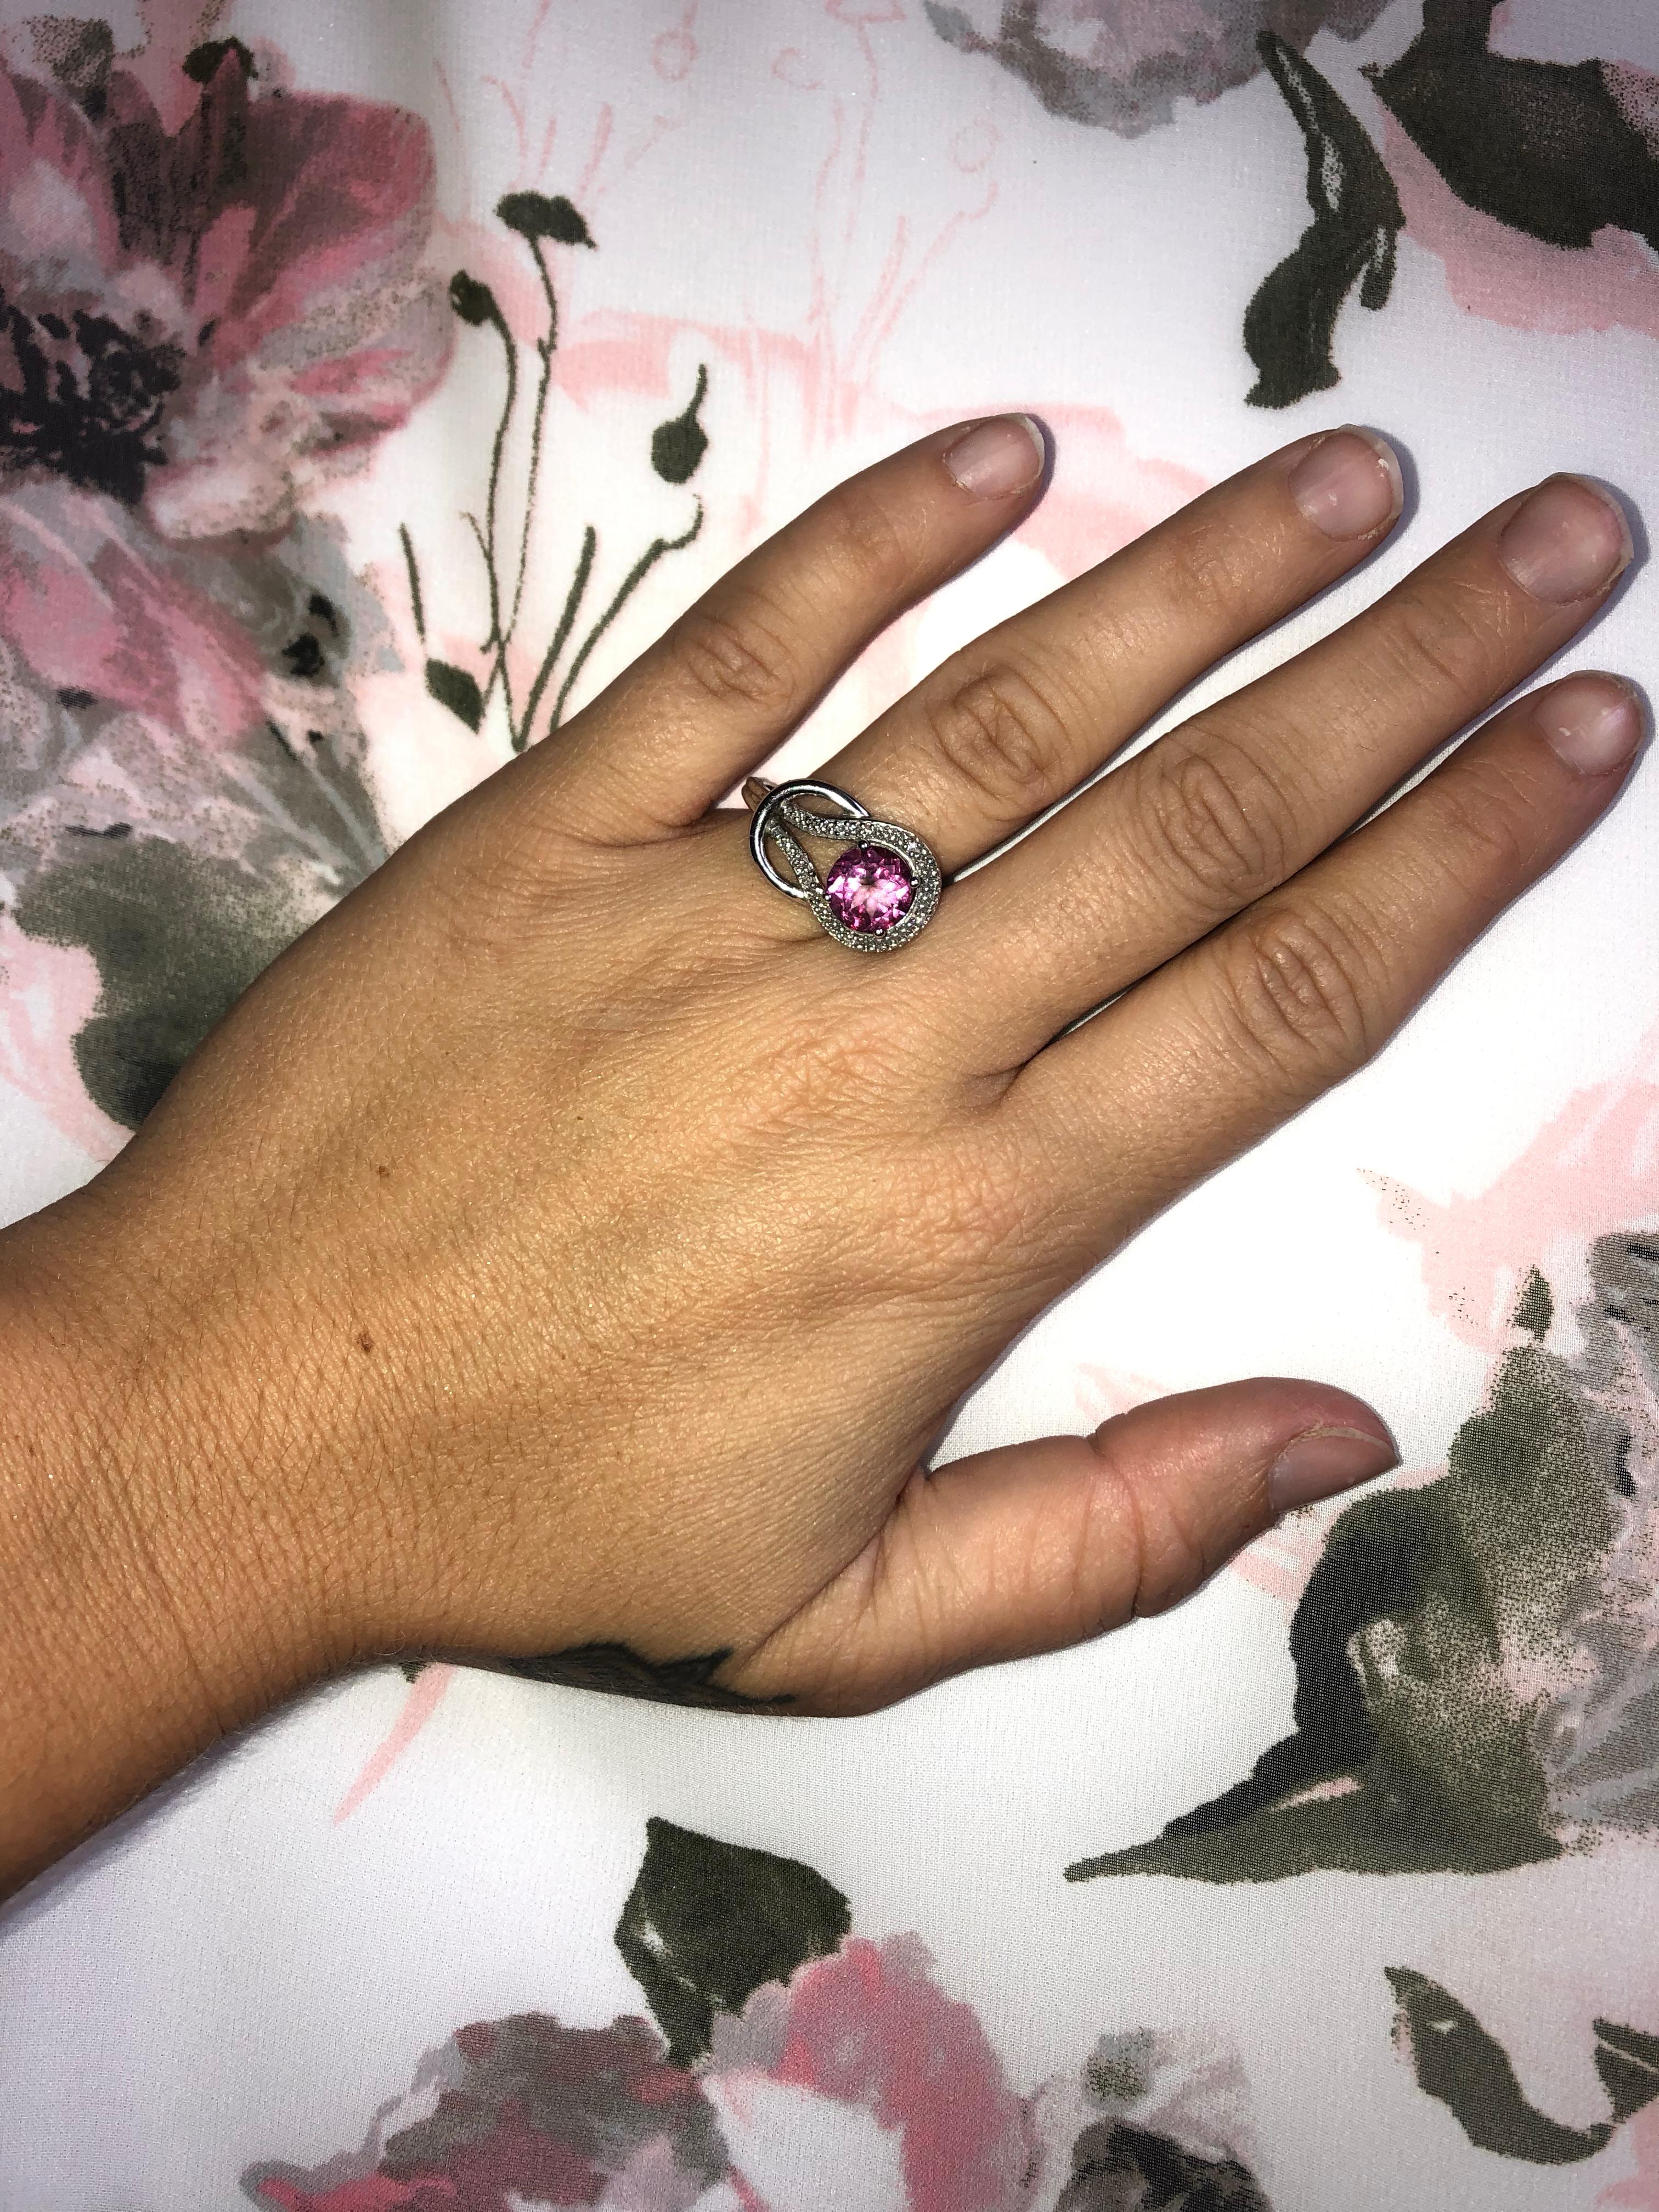 No-Brand-10K-Pink-Ring_219720A.jpg